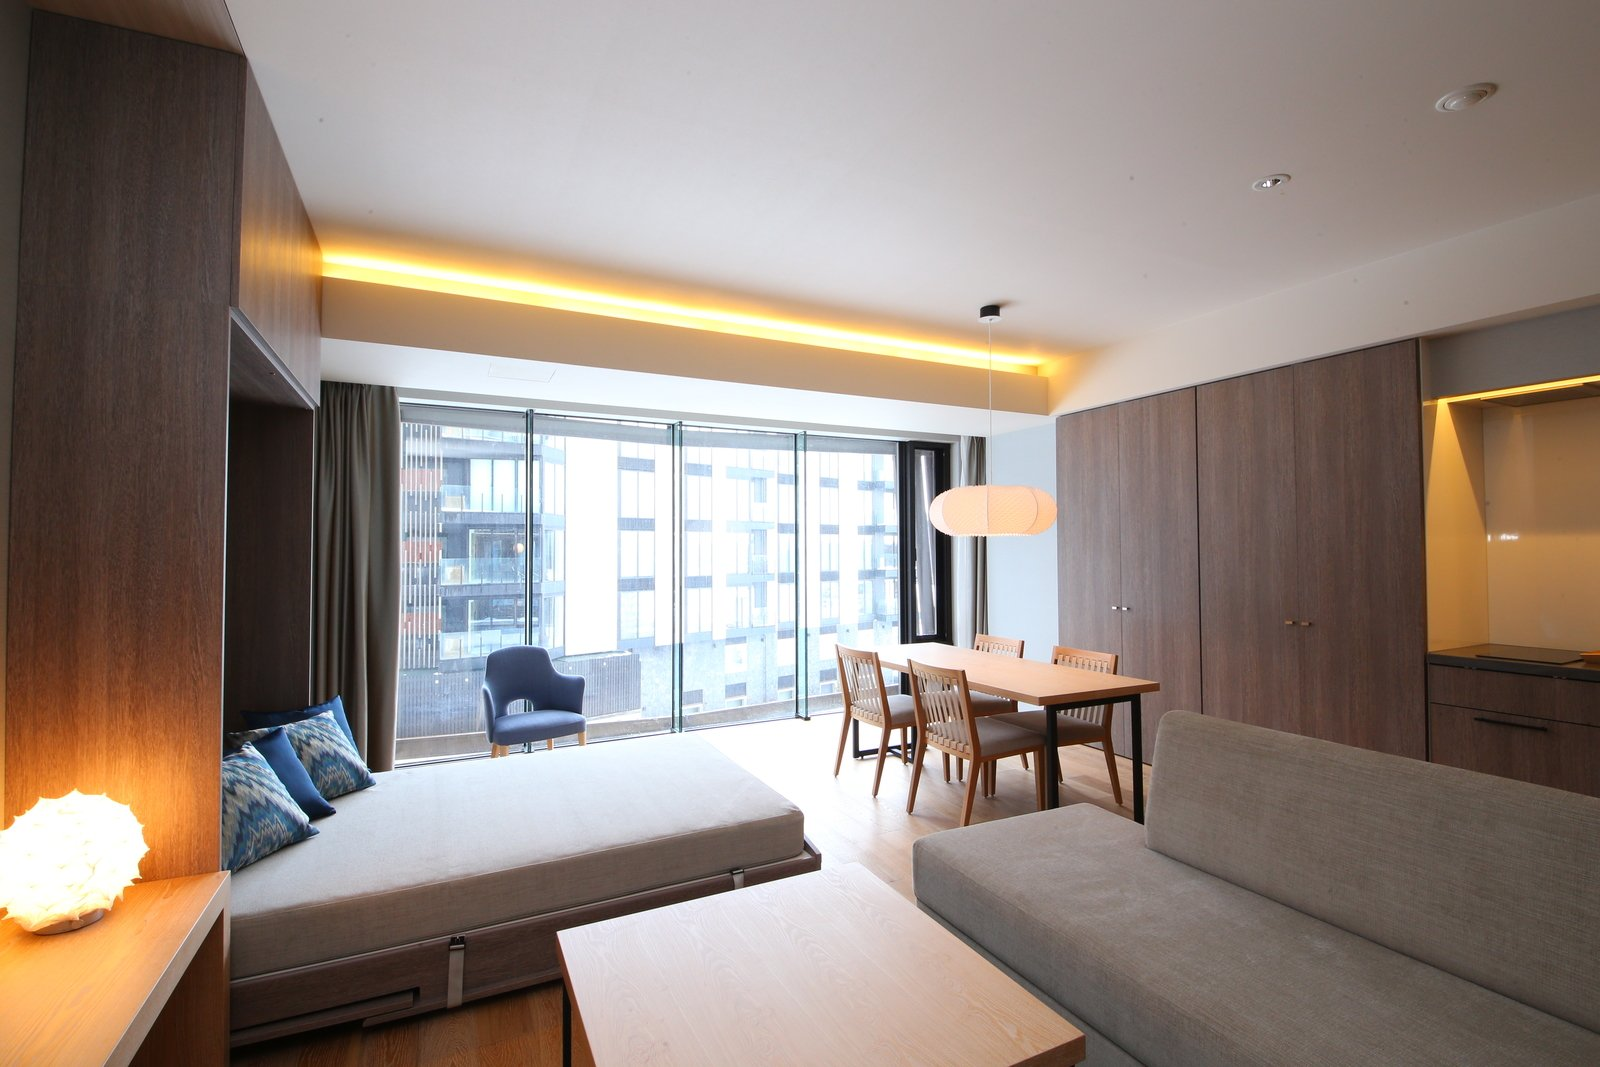 1 5 bedroom 3 large